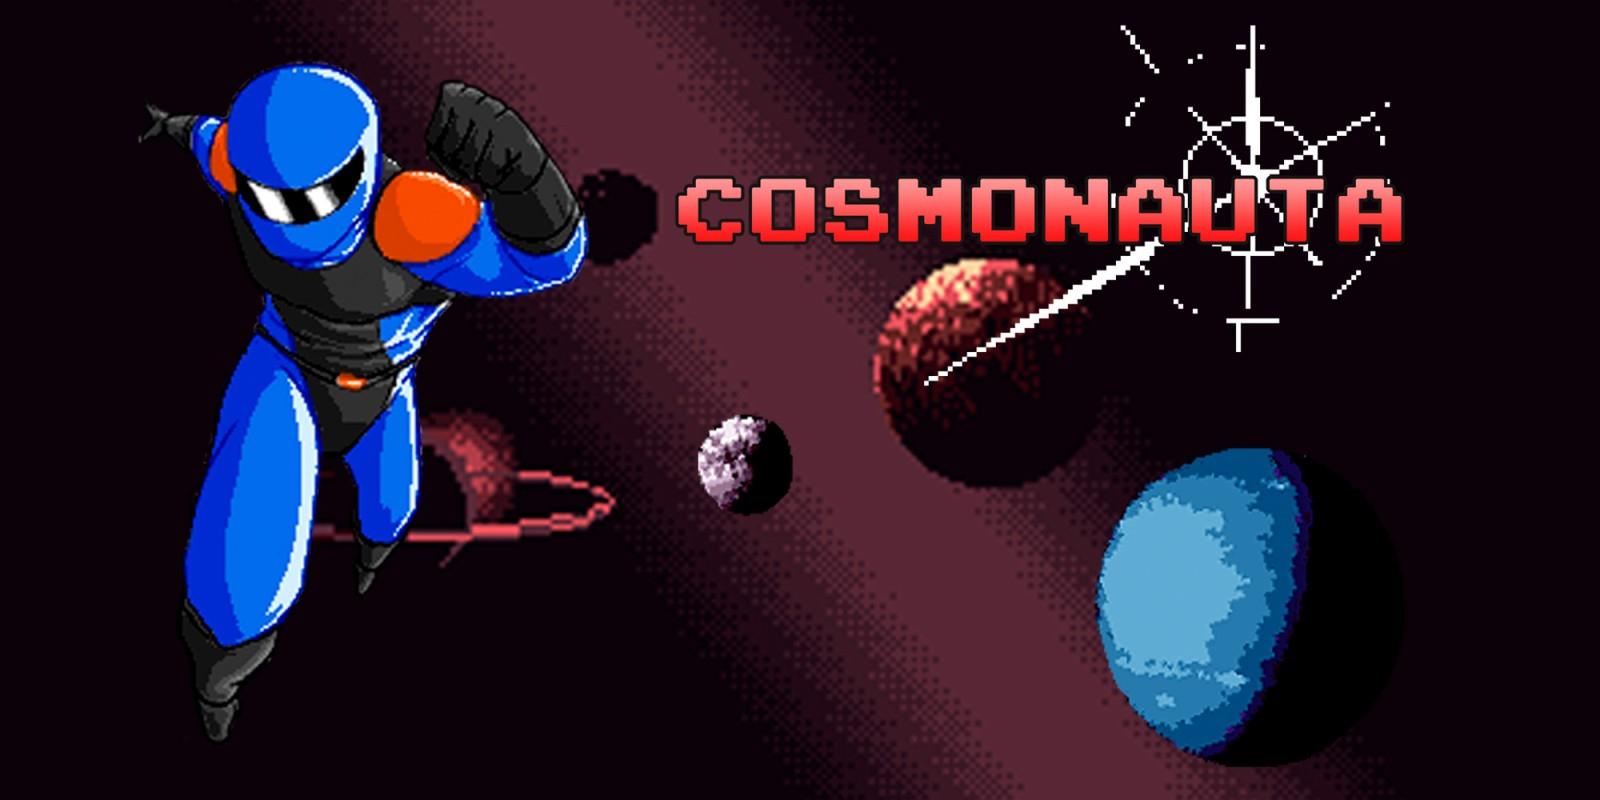 Cosmonauta Nintendo Switch 89p at Nintendo Shop